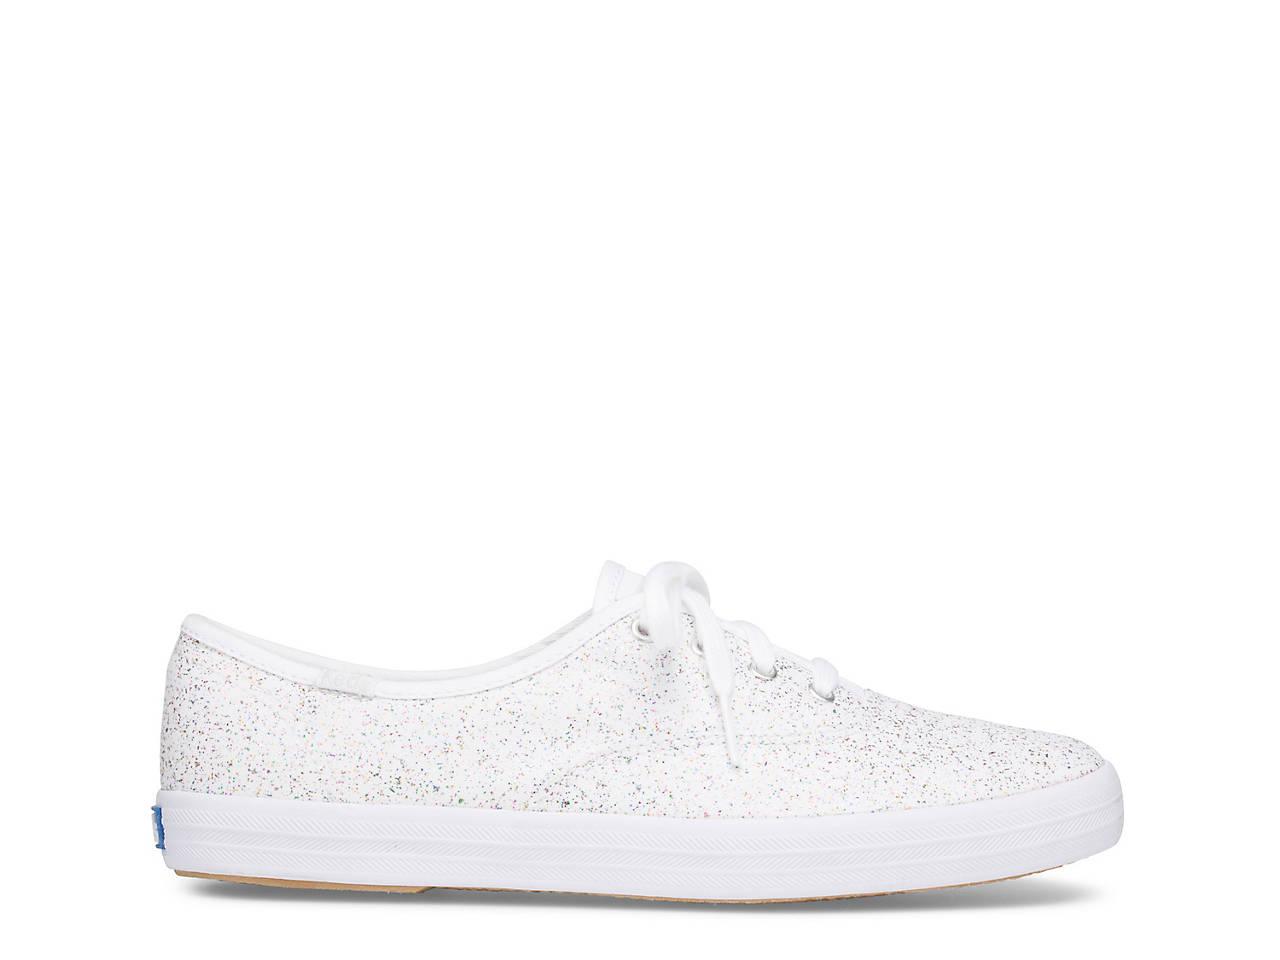 2aa82dfc571 Keds Champion Starlight Sneaker - Women s Women s Shoes